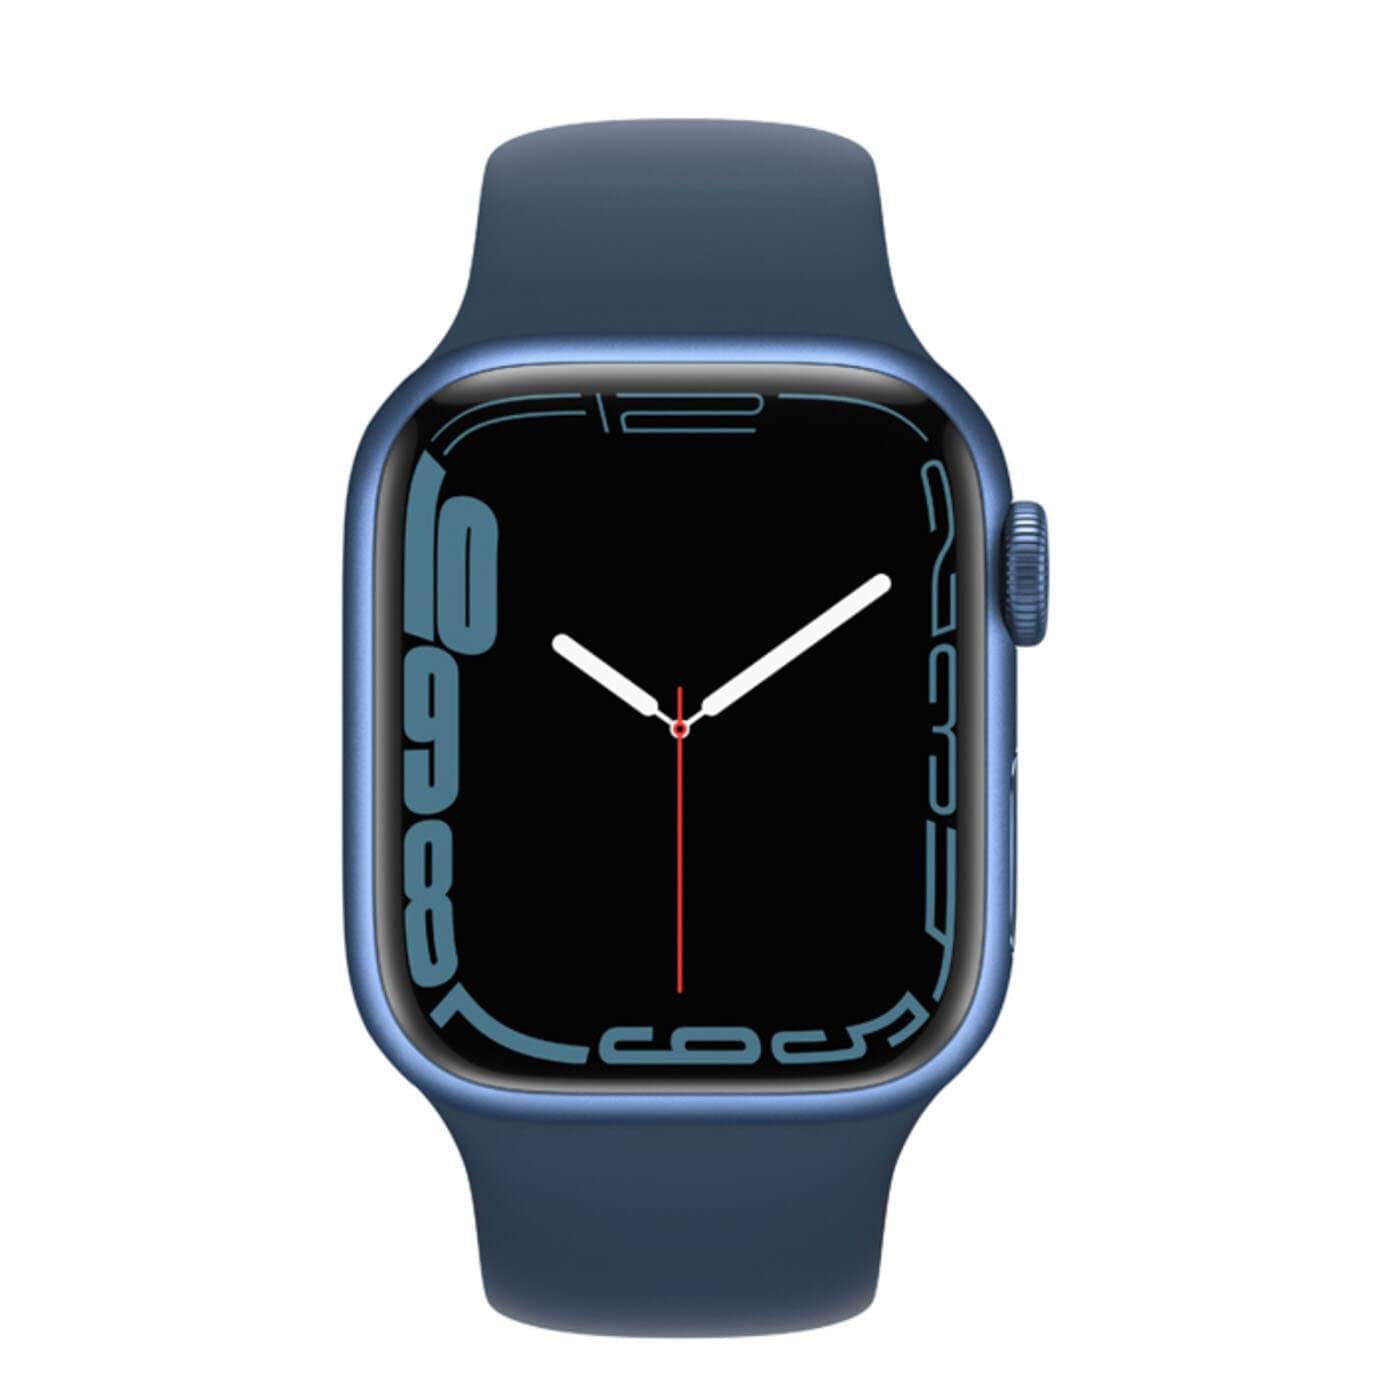 Apple Watch Series 7 Aluminiumboett, Sportband - Blå